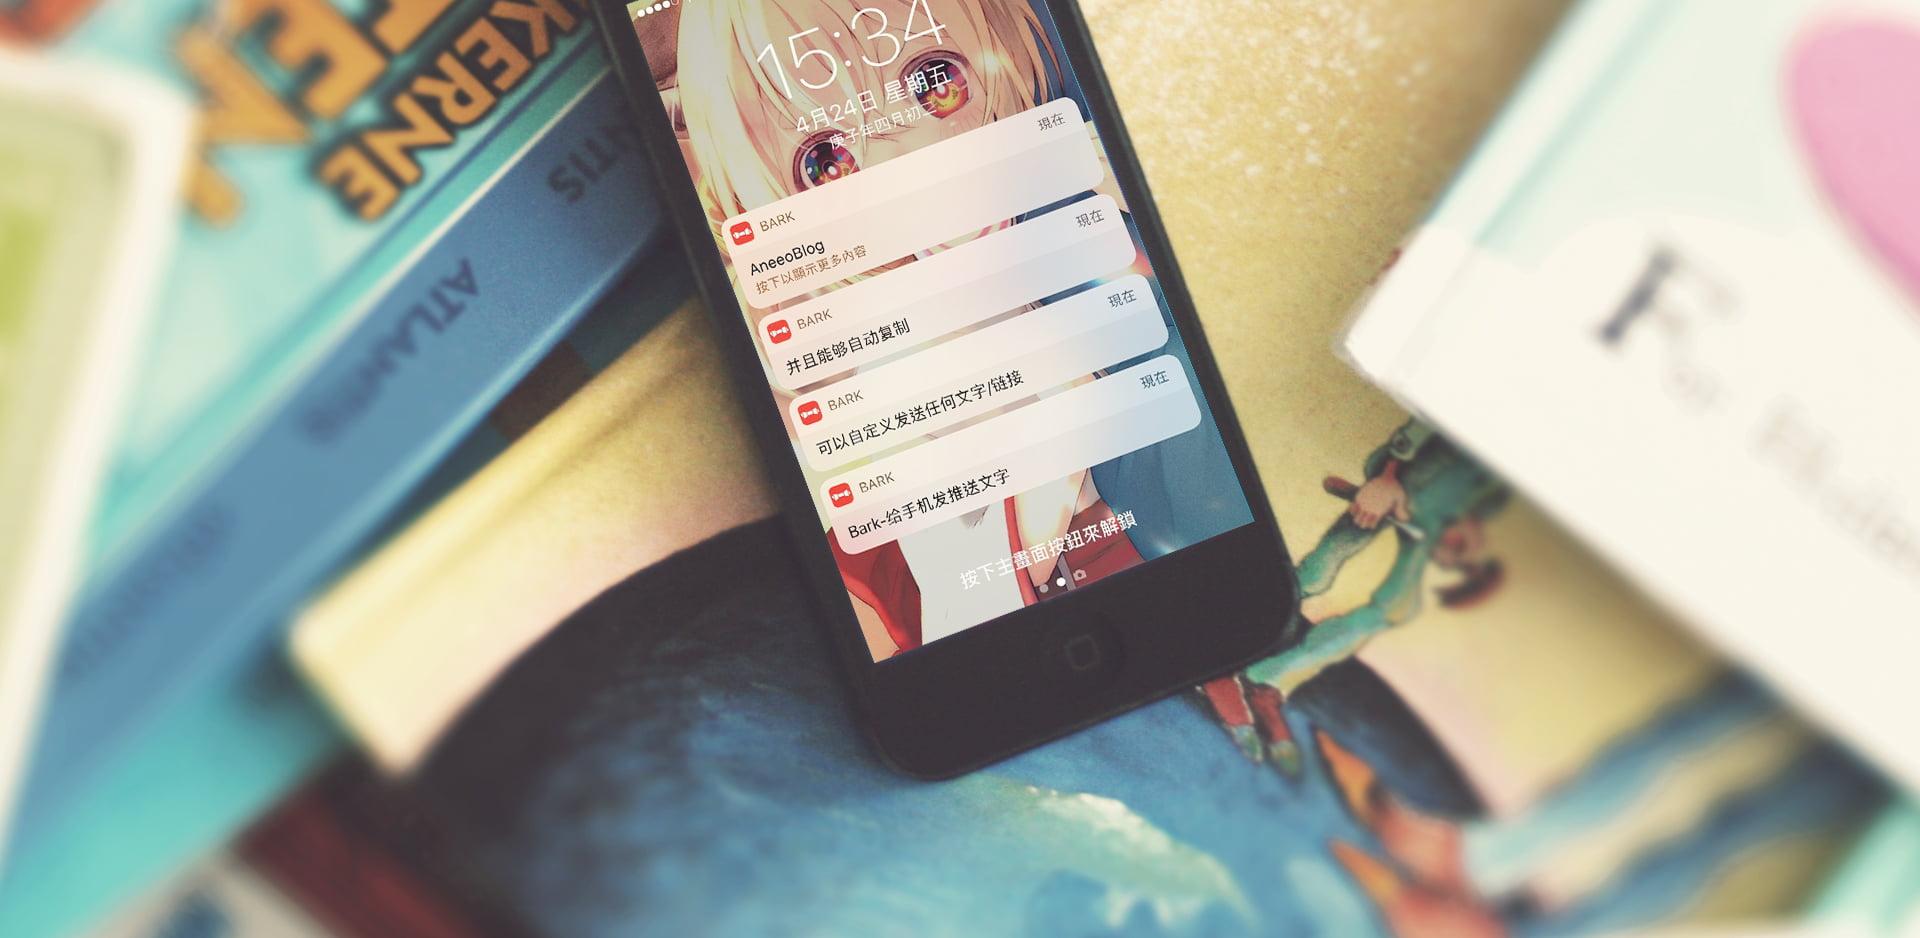 Bark-给手机发推送文字(苹果+安卓),可自动复制